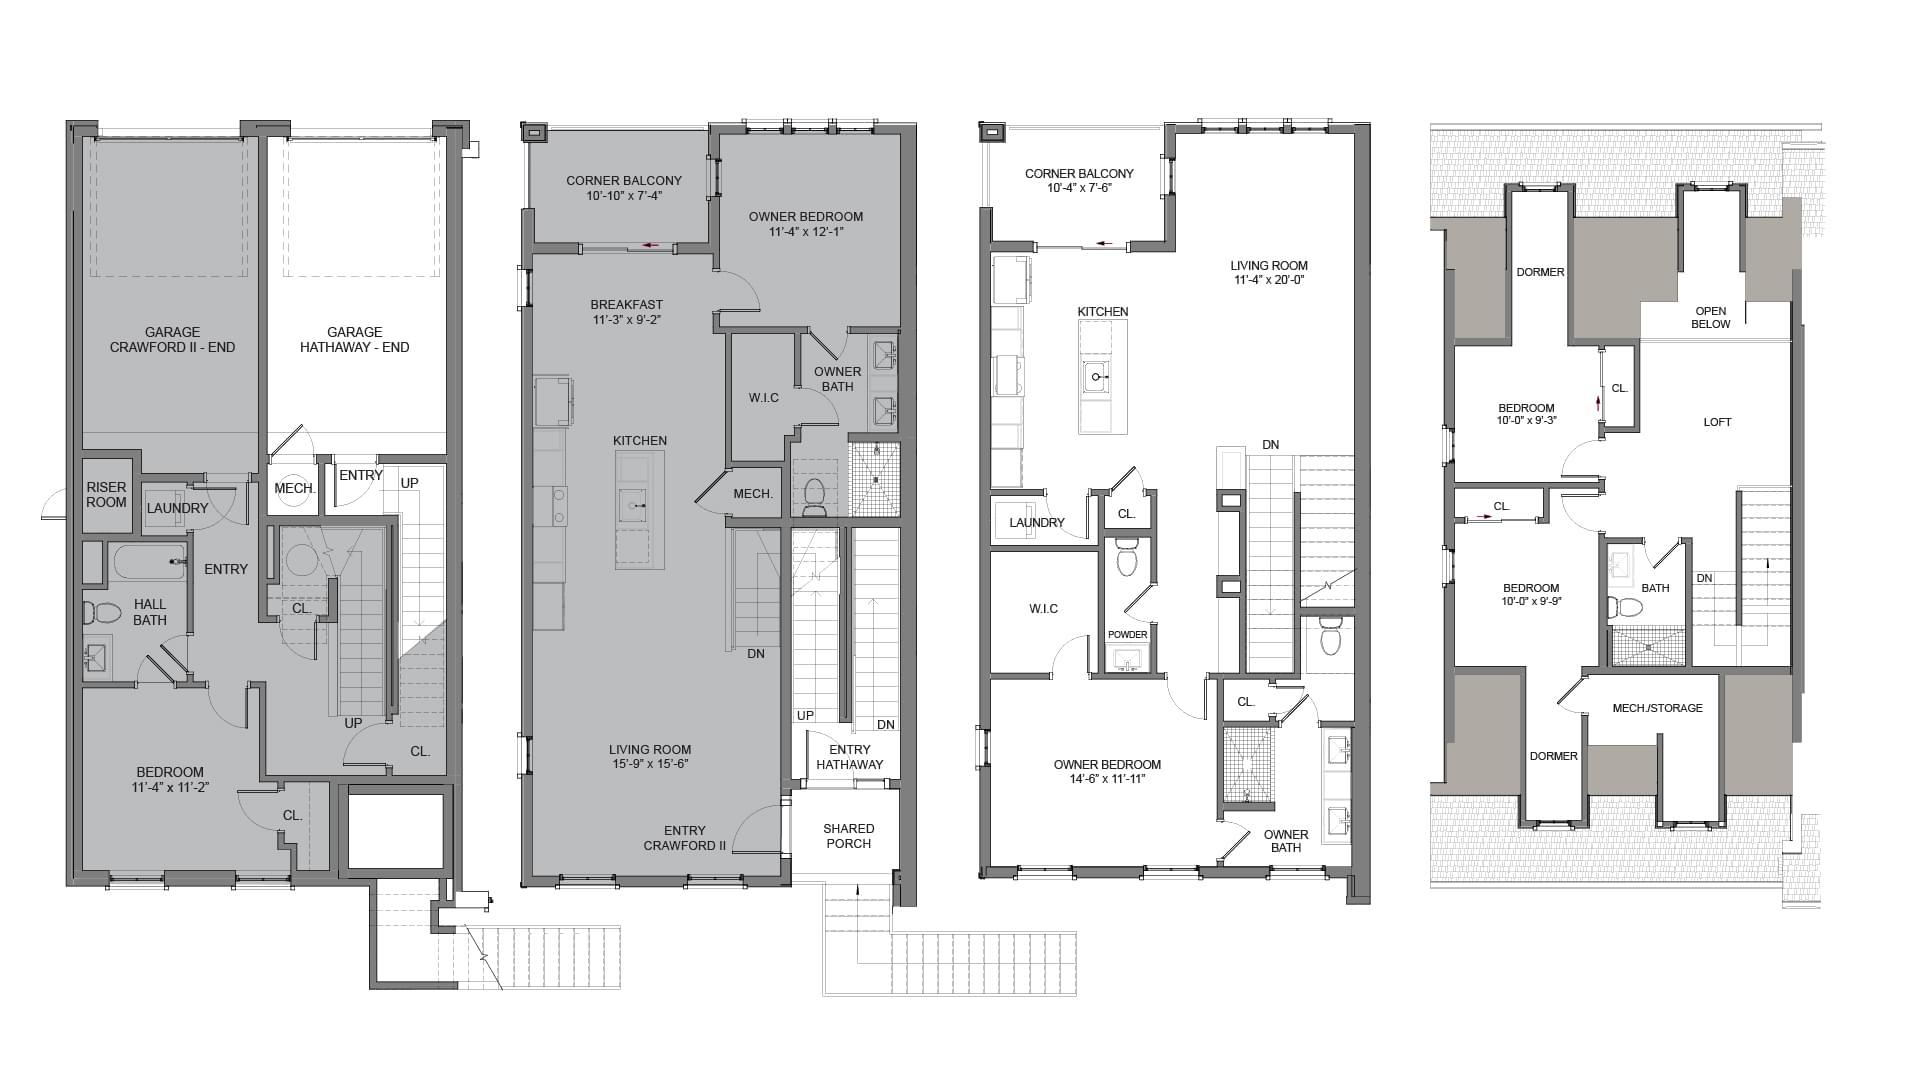 Floor Plans - End Unit L. 3br New Home in Alpharetta, GA